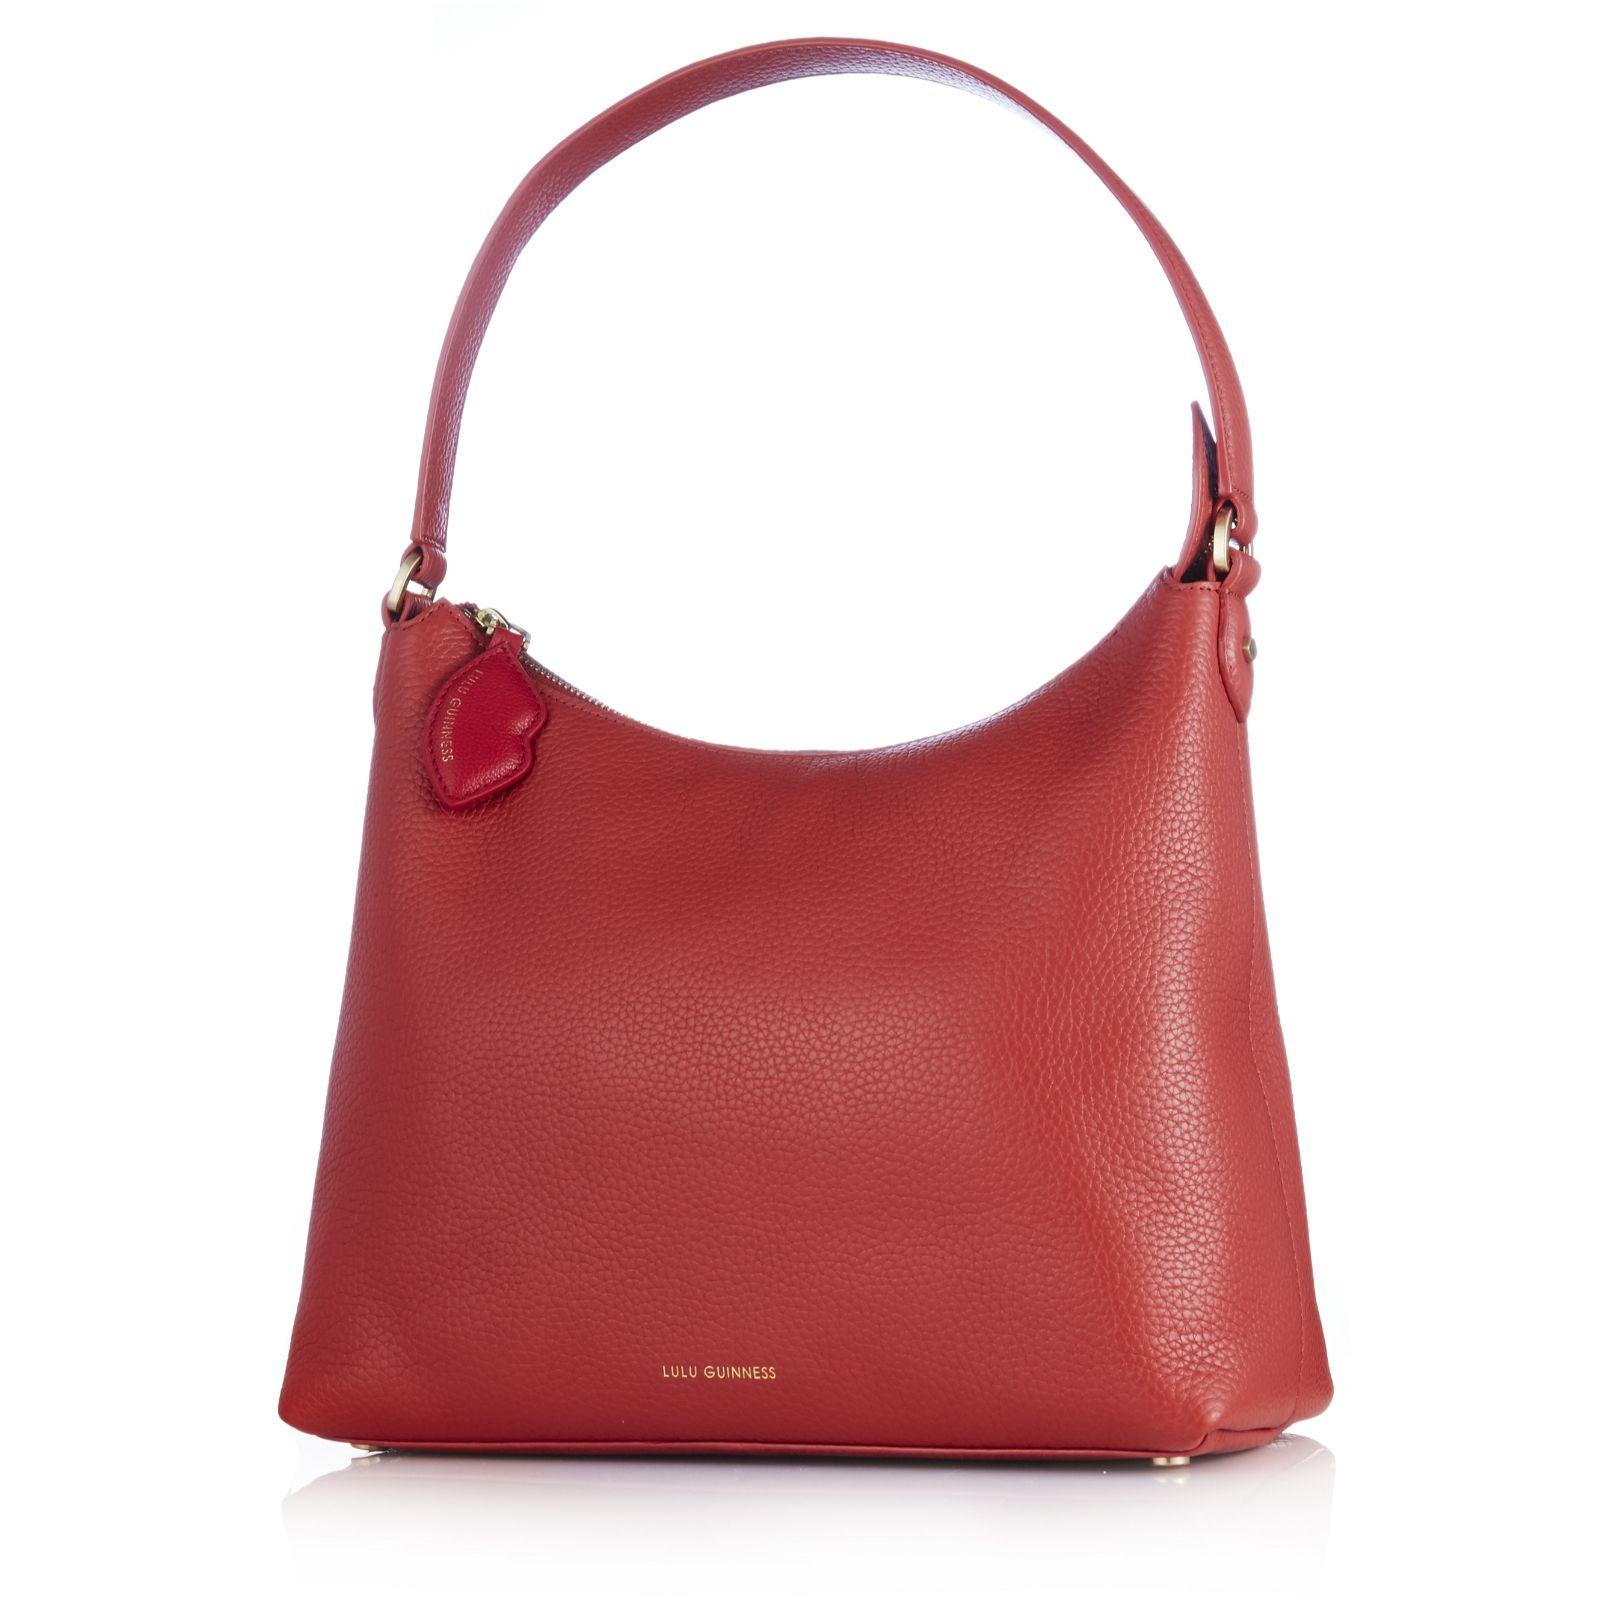 463b485013493 Lulu Guinness Lucilla Grainy Leather Hobo Bag - QVC UK